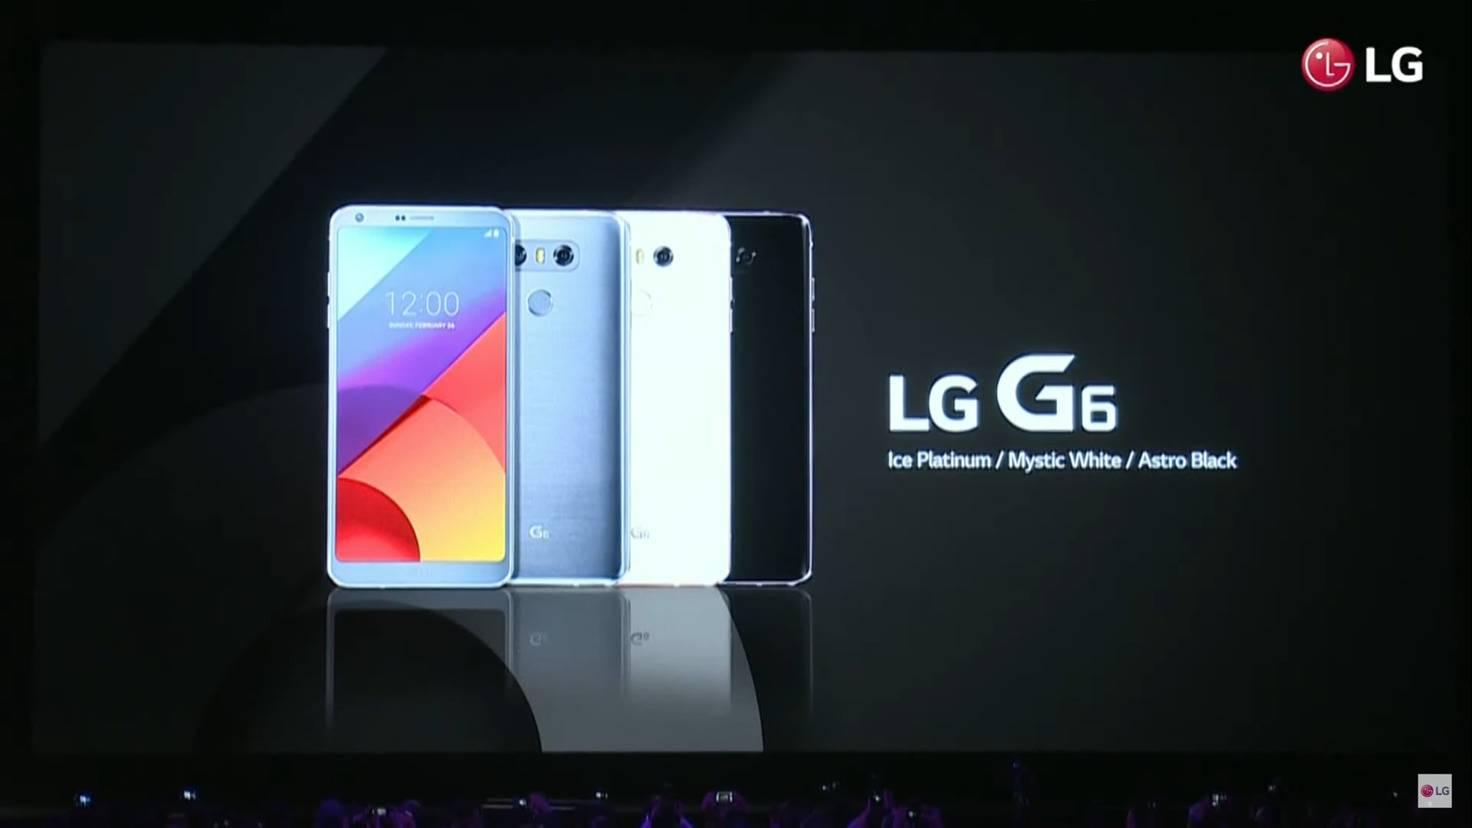 LG G6 6